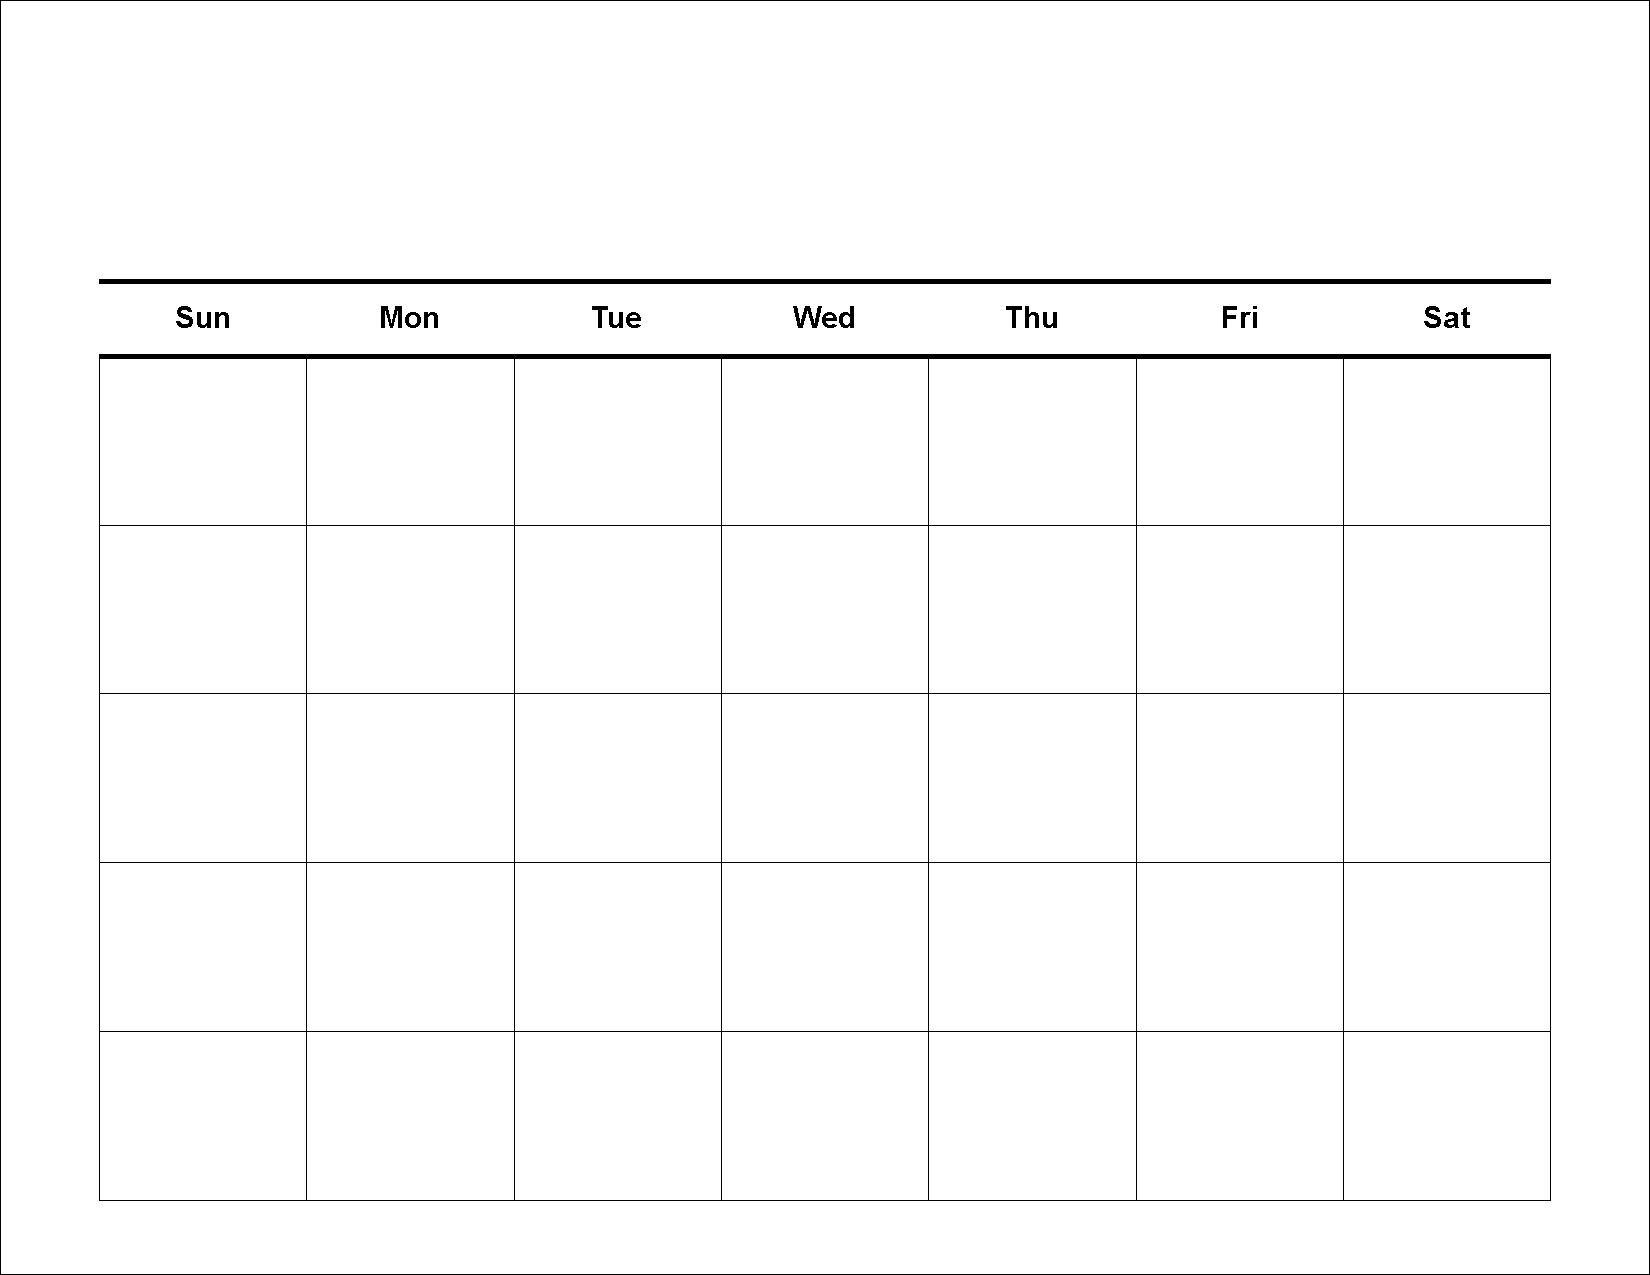 30-Day-Calendar-Template-Printable-Large for One Week Blank Calendar Printable